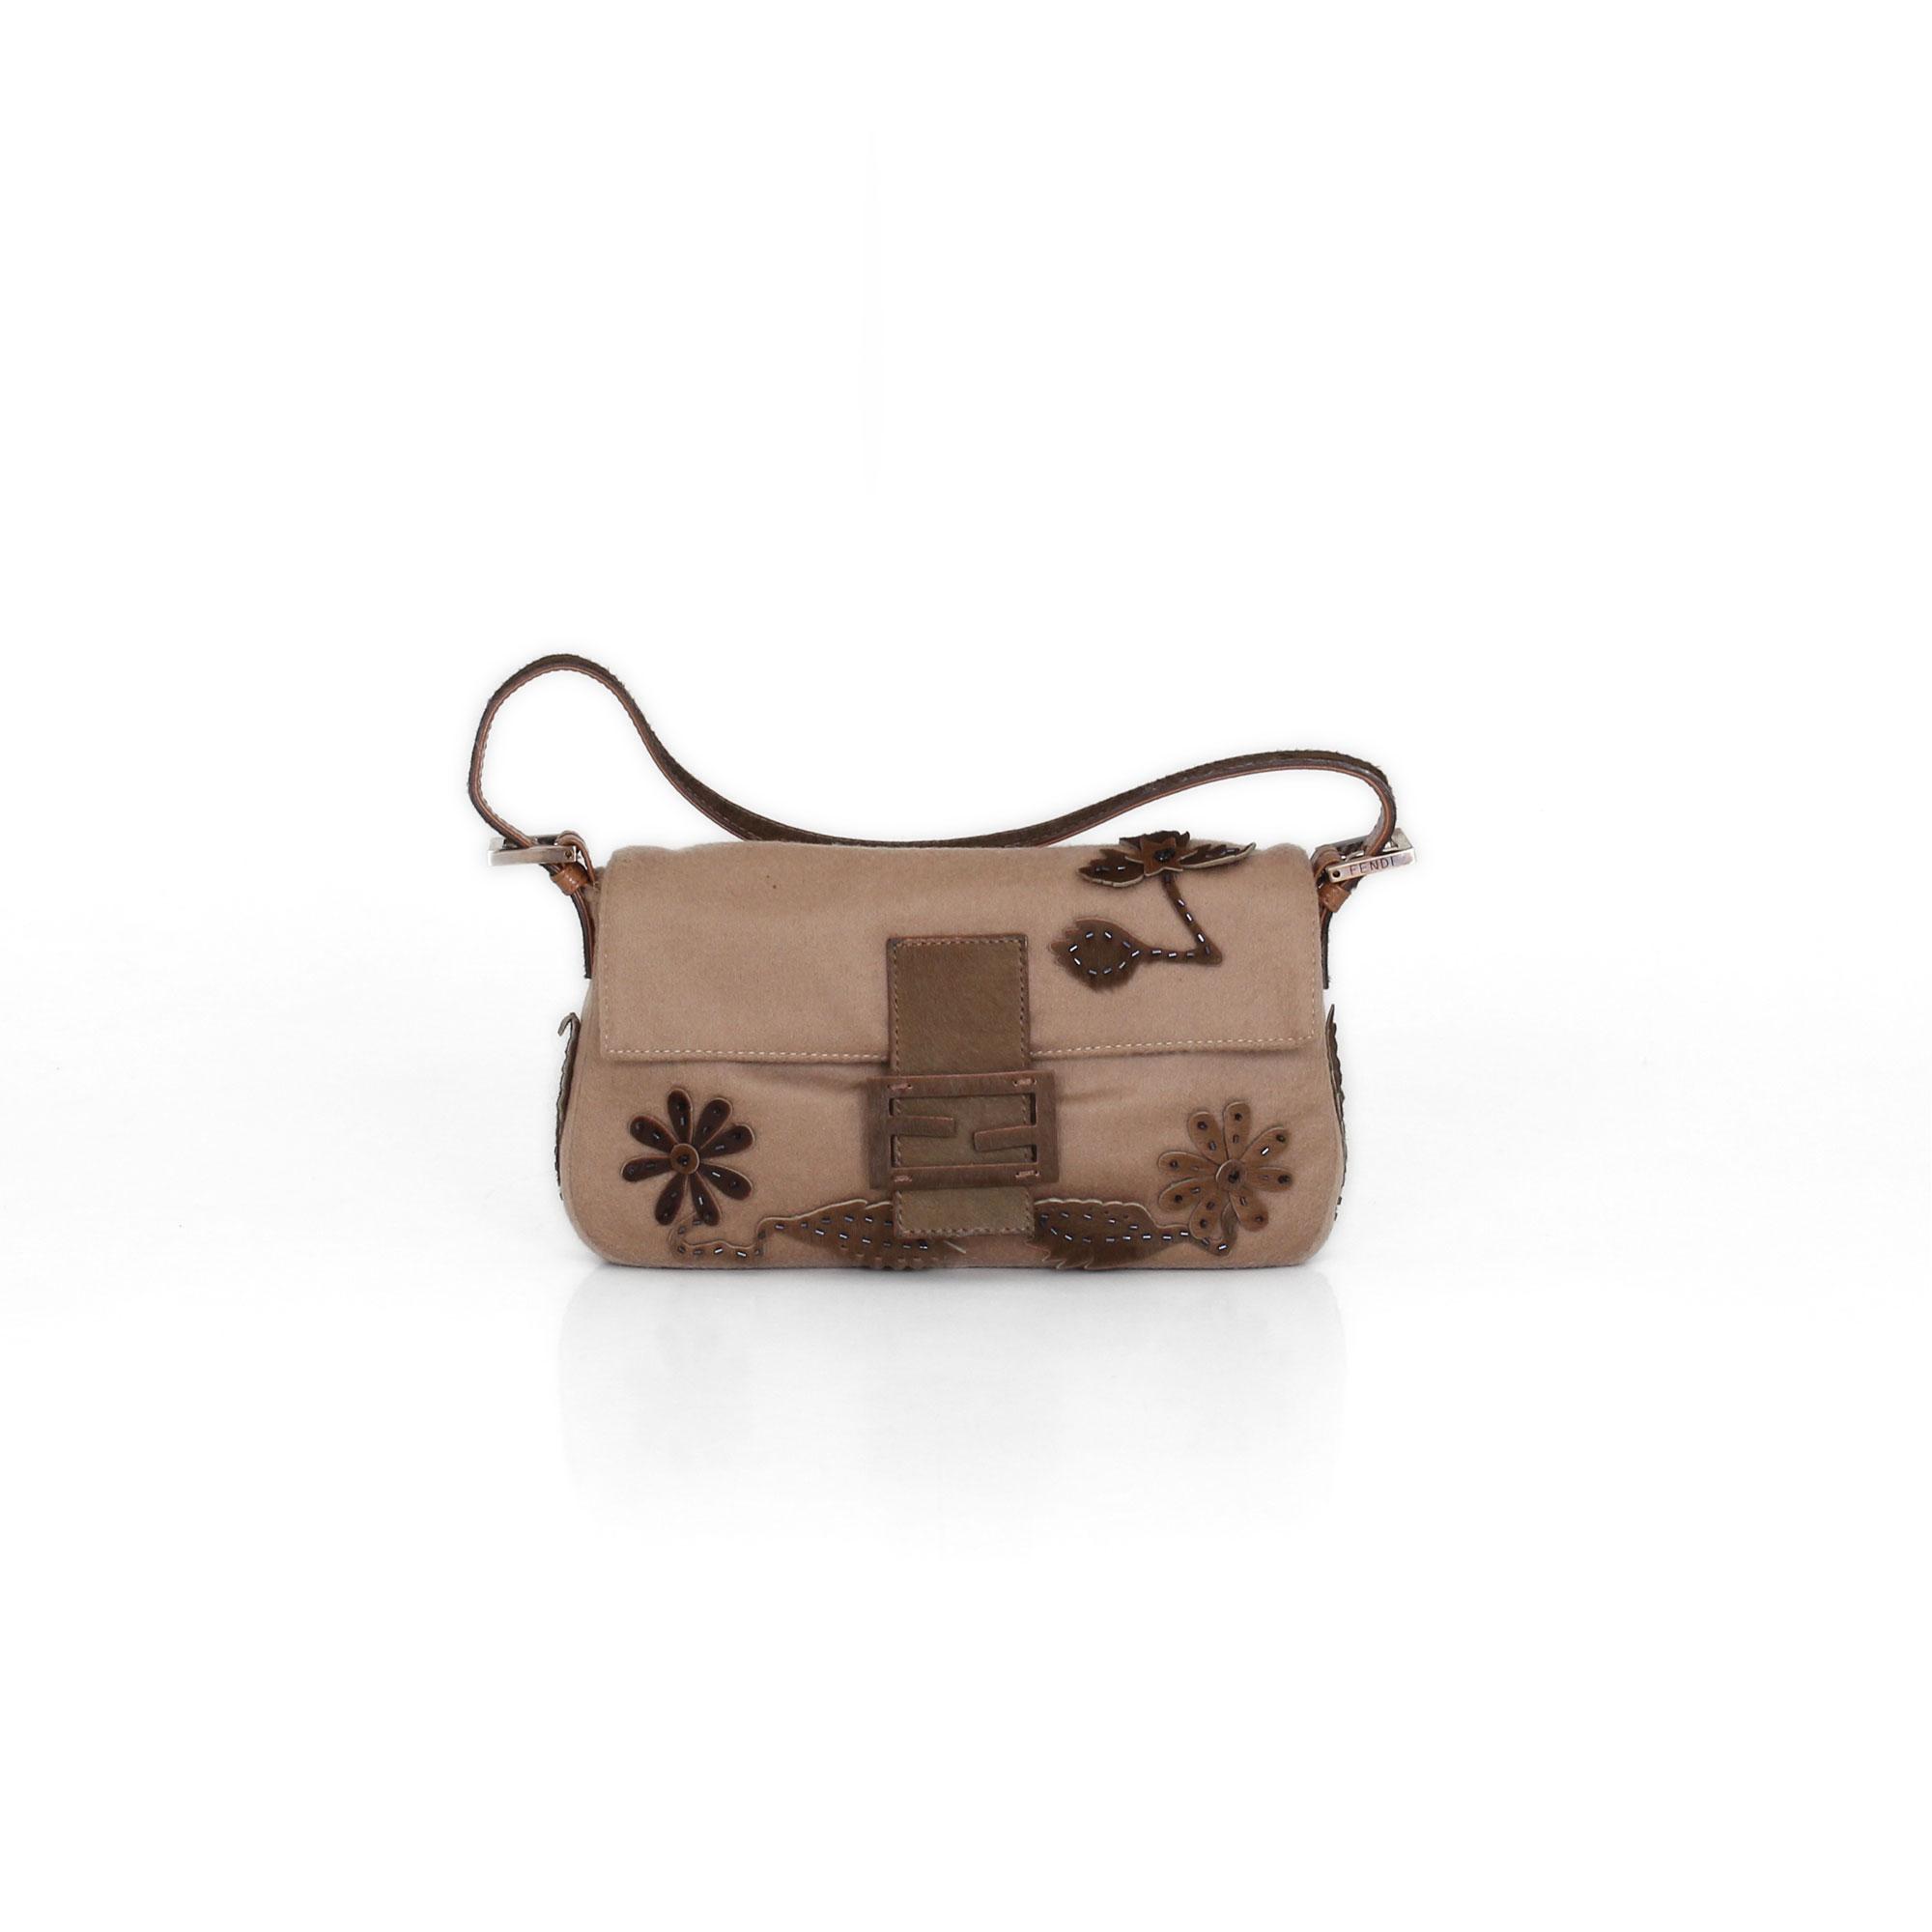 eefabaa7bf8ae Bolso Fendi. Fendi cashmere Baguette bag